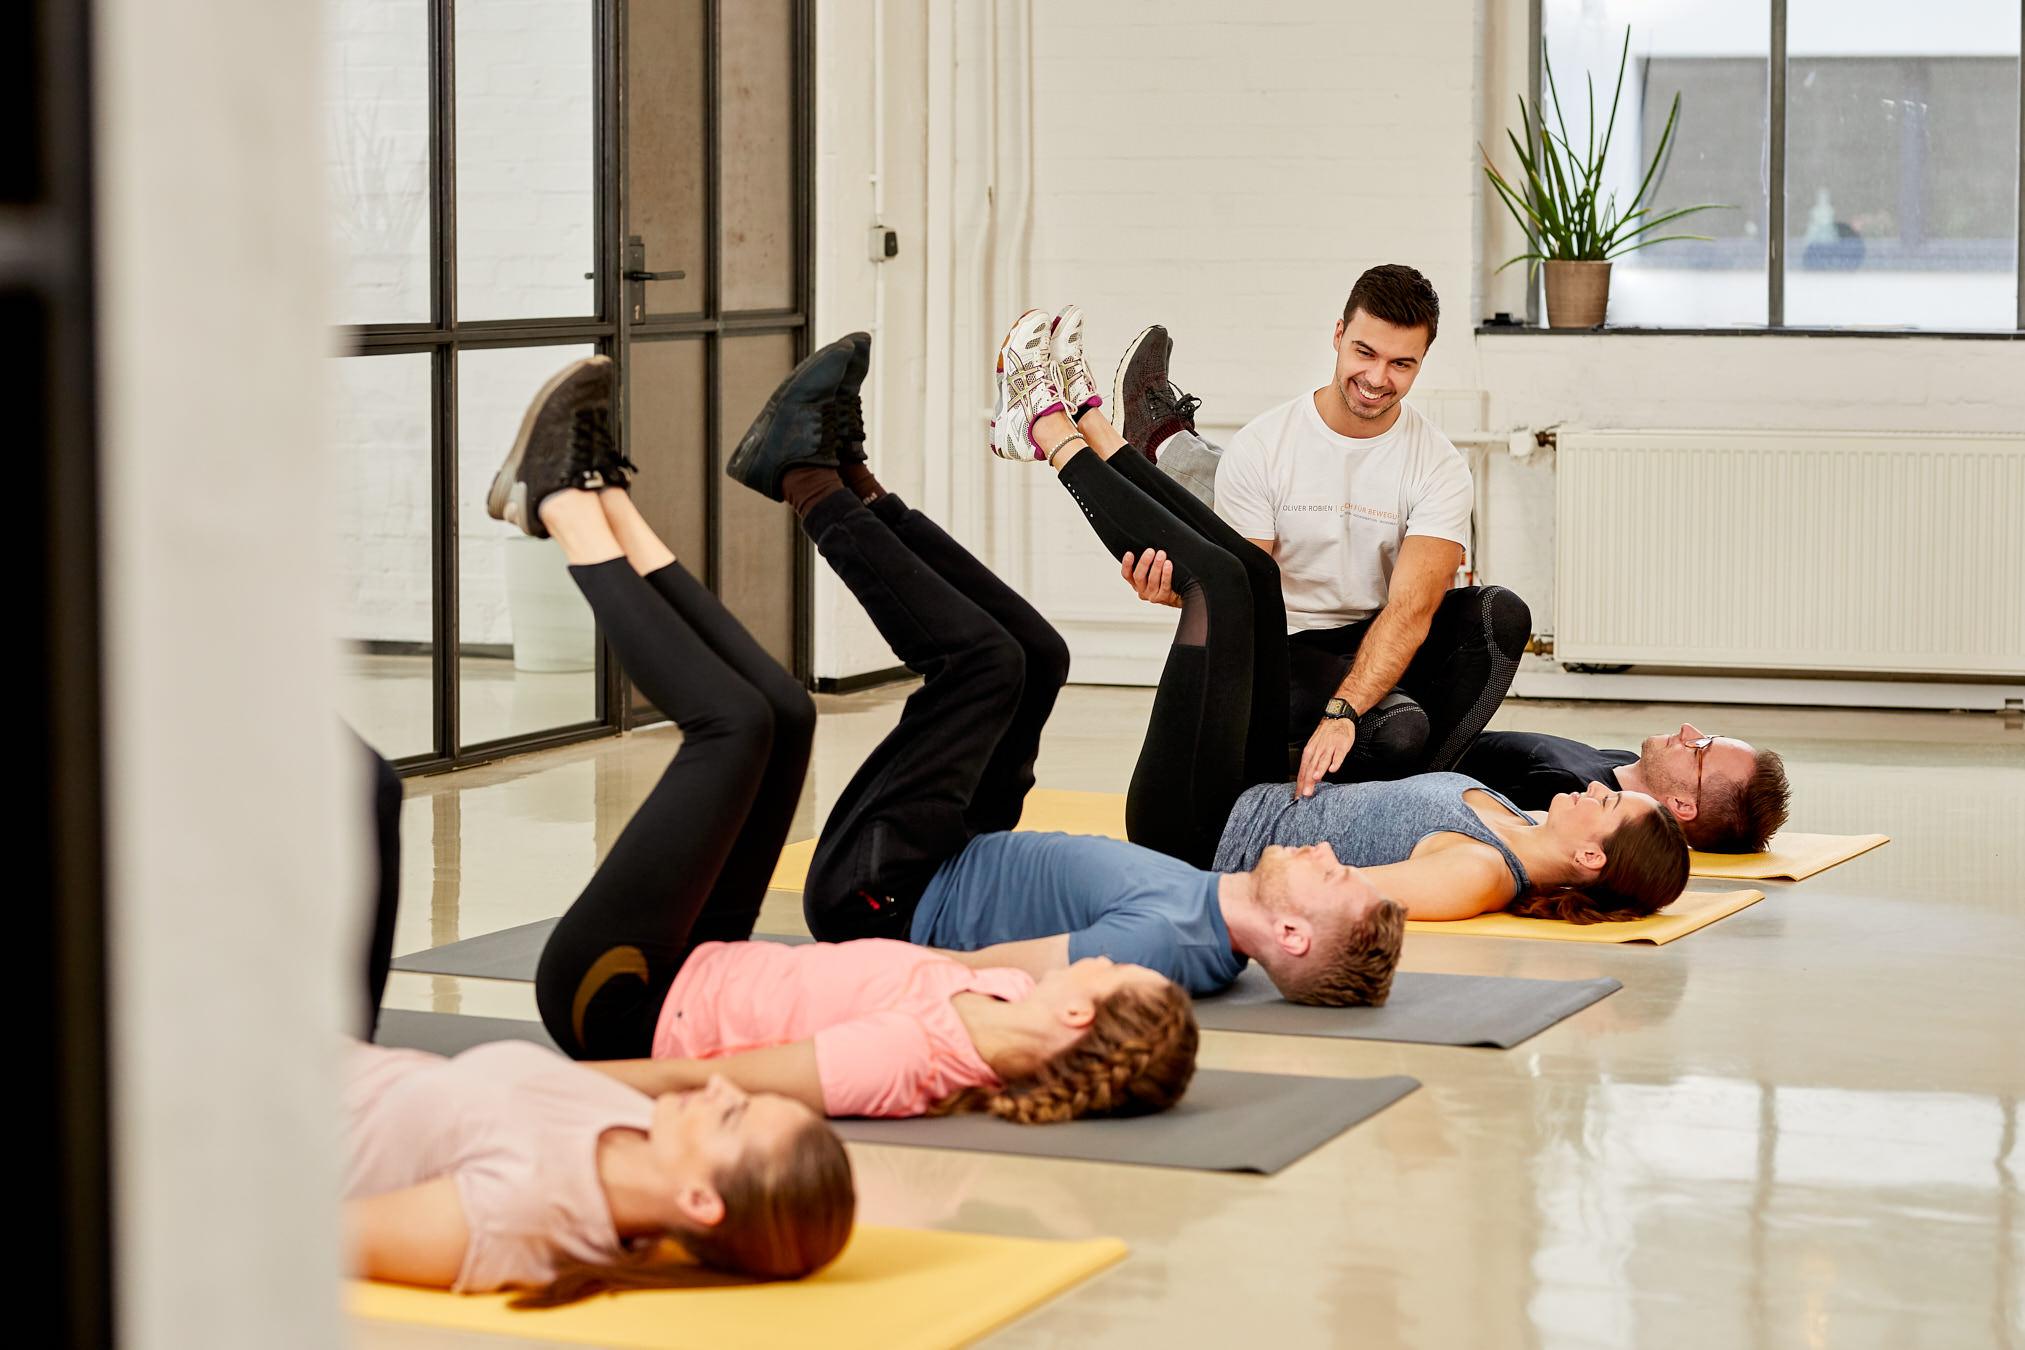 oliver robien coach bewegung sport koeln gruppentraining ernaehrung gesundheit joern strojny